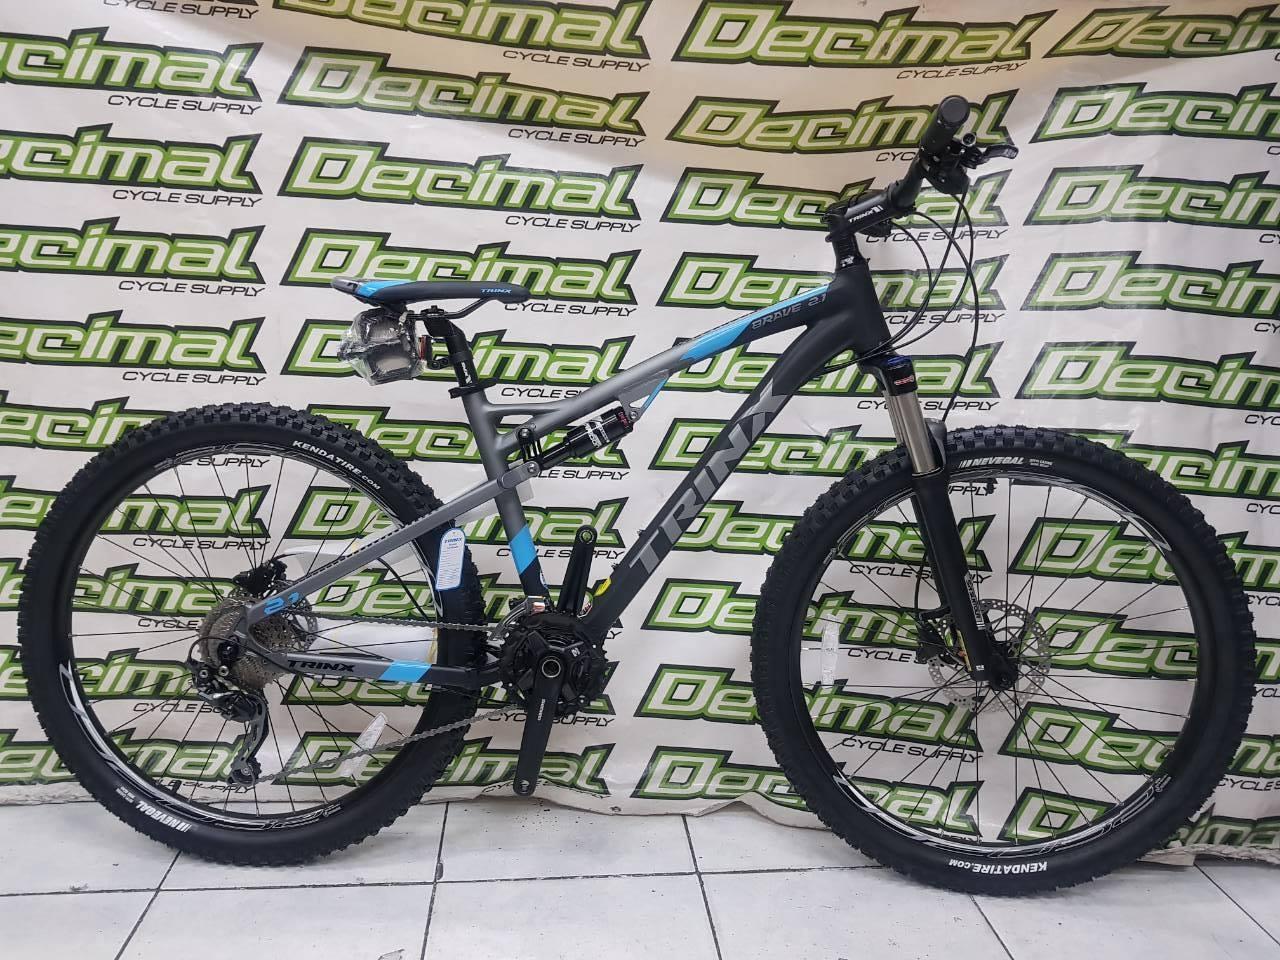 Trinx Brave 2 1 Full Suspension Mountain Bike 27 5 Shimano Deore 10 Speed